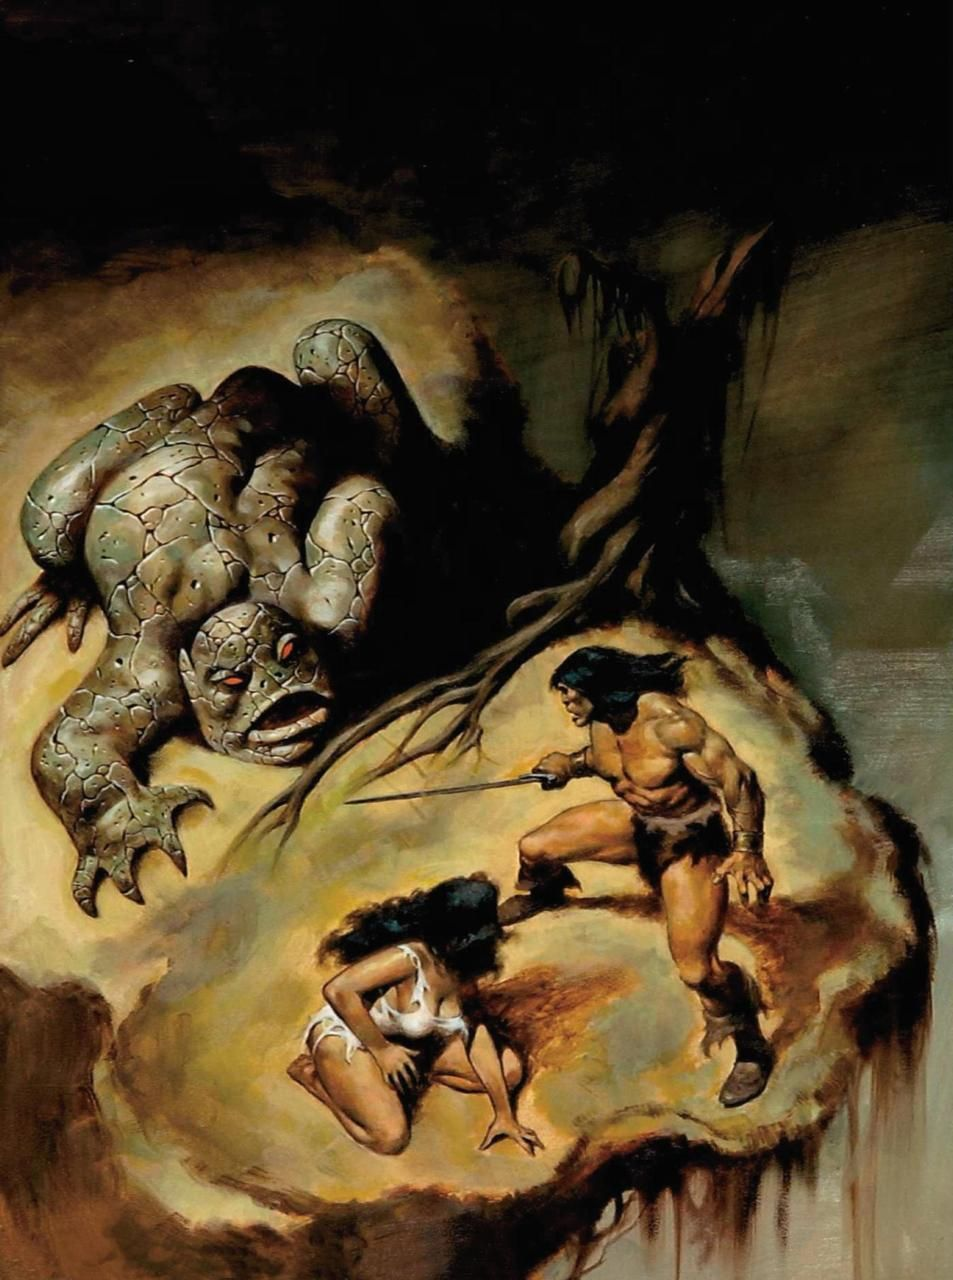 swordandsorcerytales:  Conan by John Buscema.